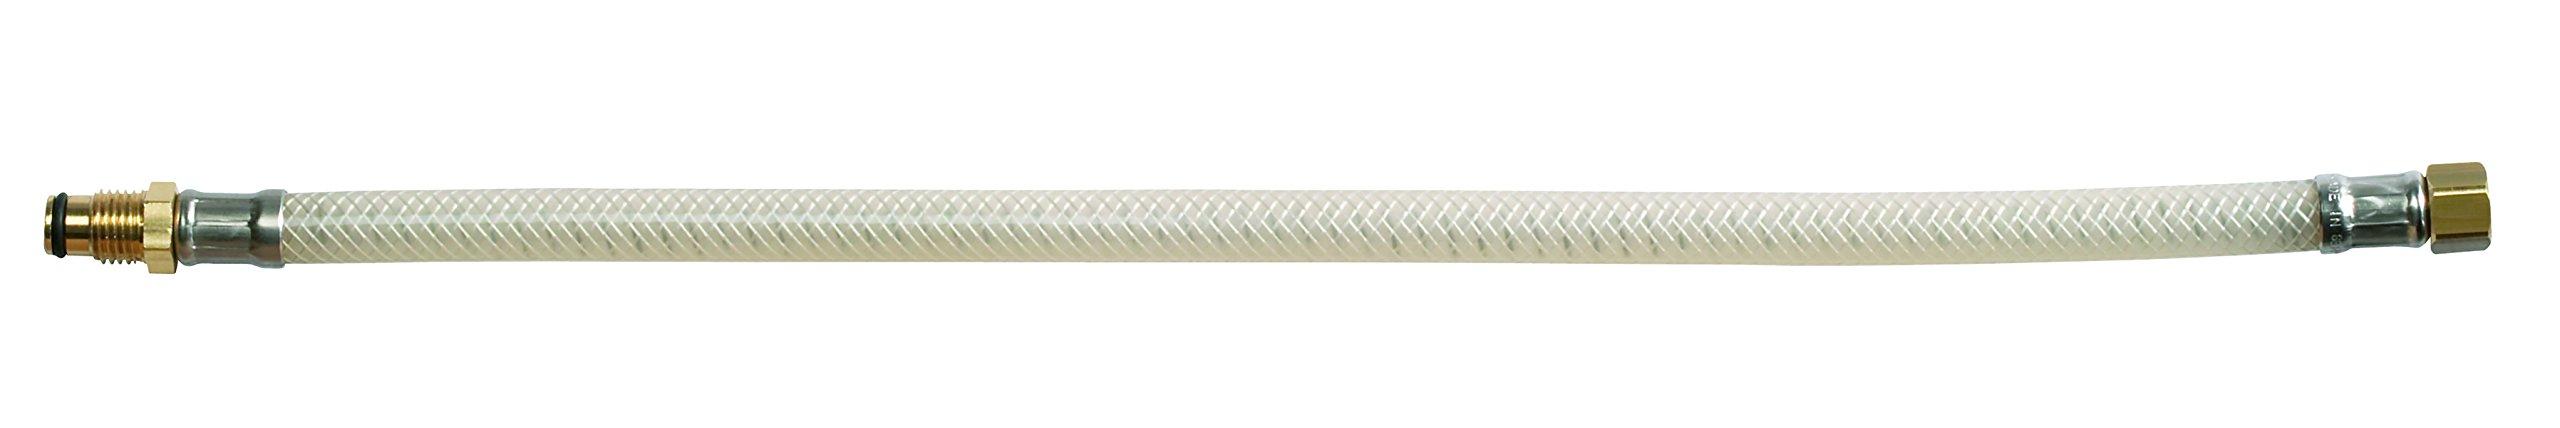 KOHLER GENUINE PART GP73151-A HOSE (16.5'' LONG)